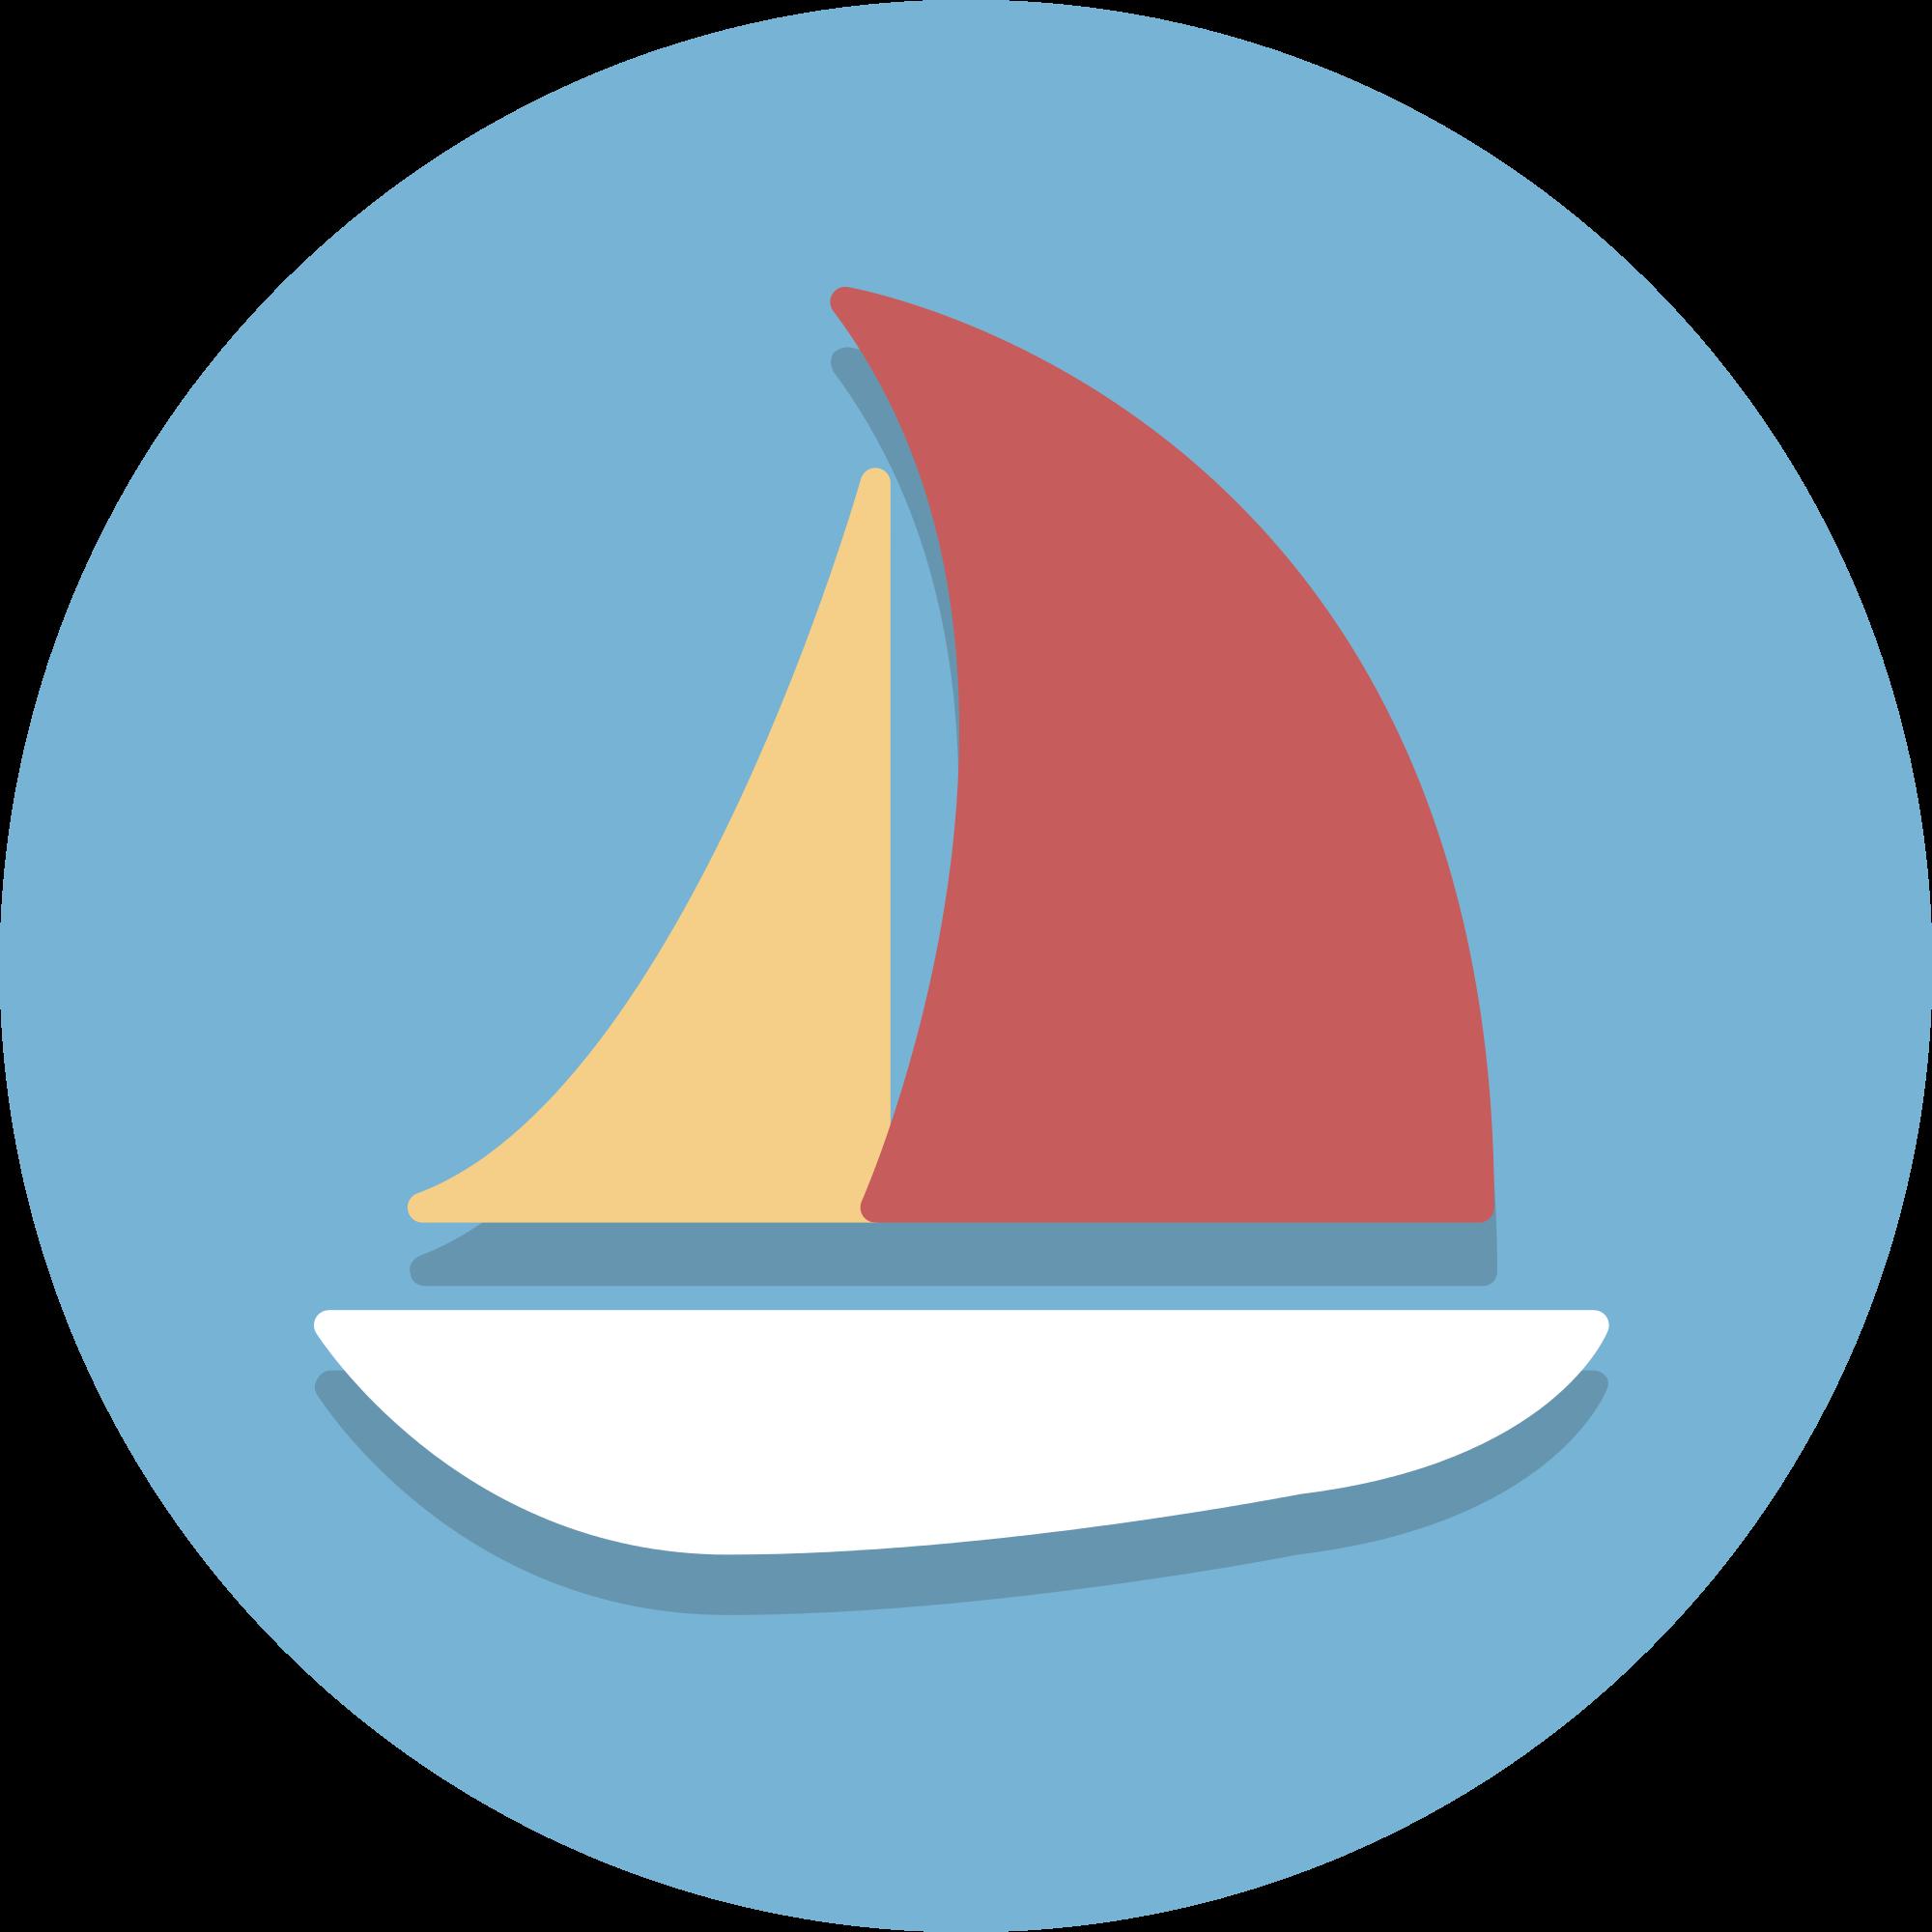 clip library download Sailboat svg. File circle icons wikimedia